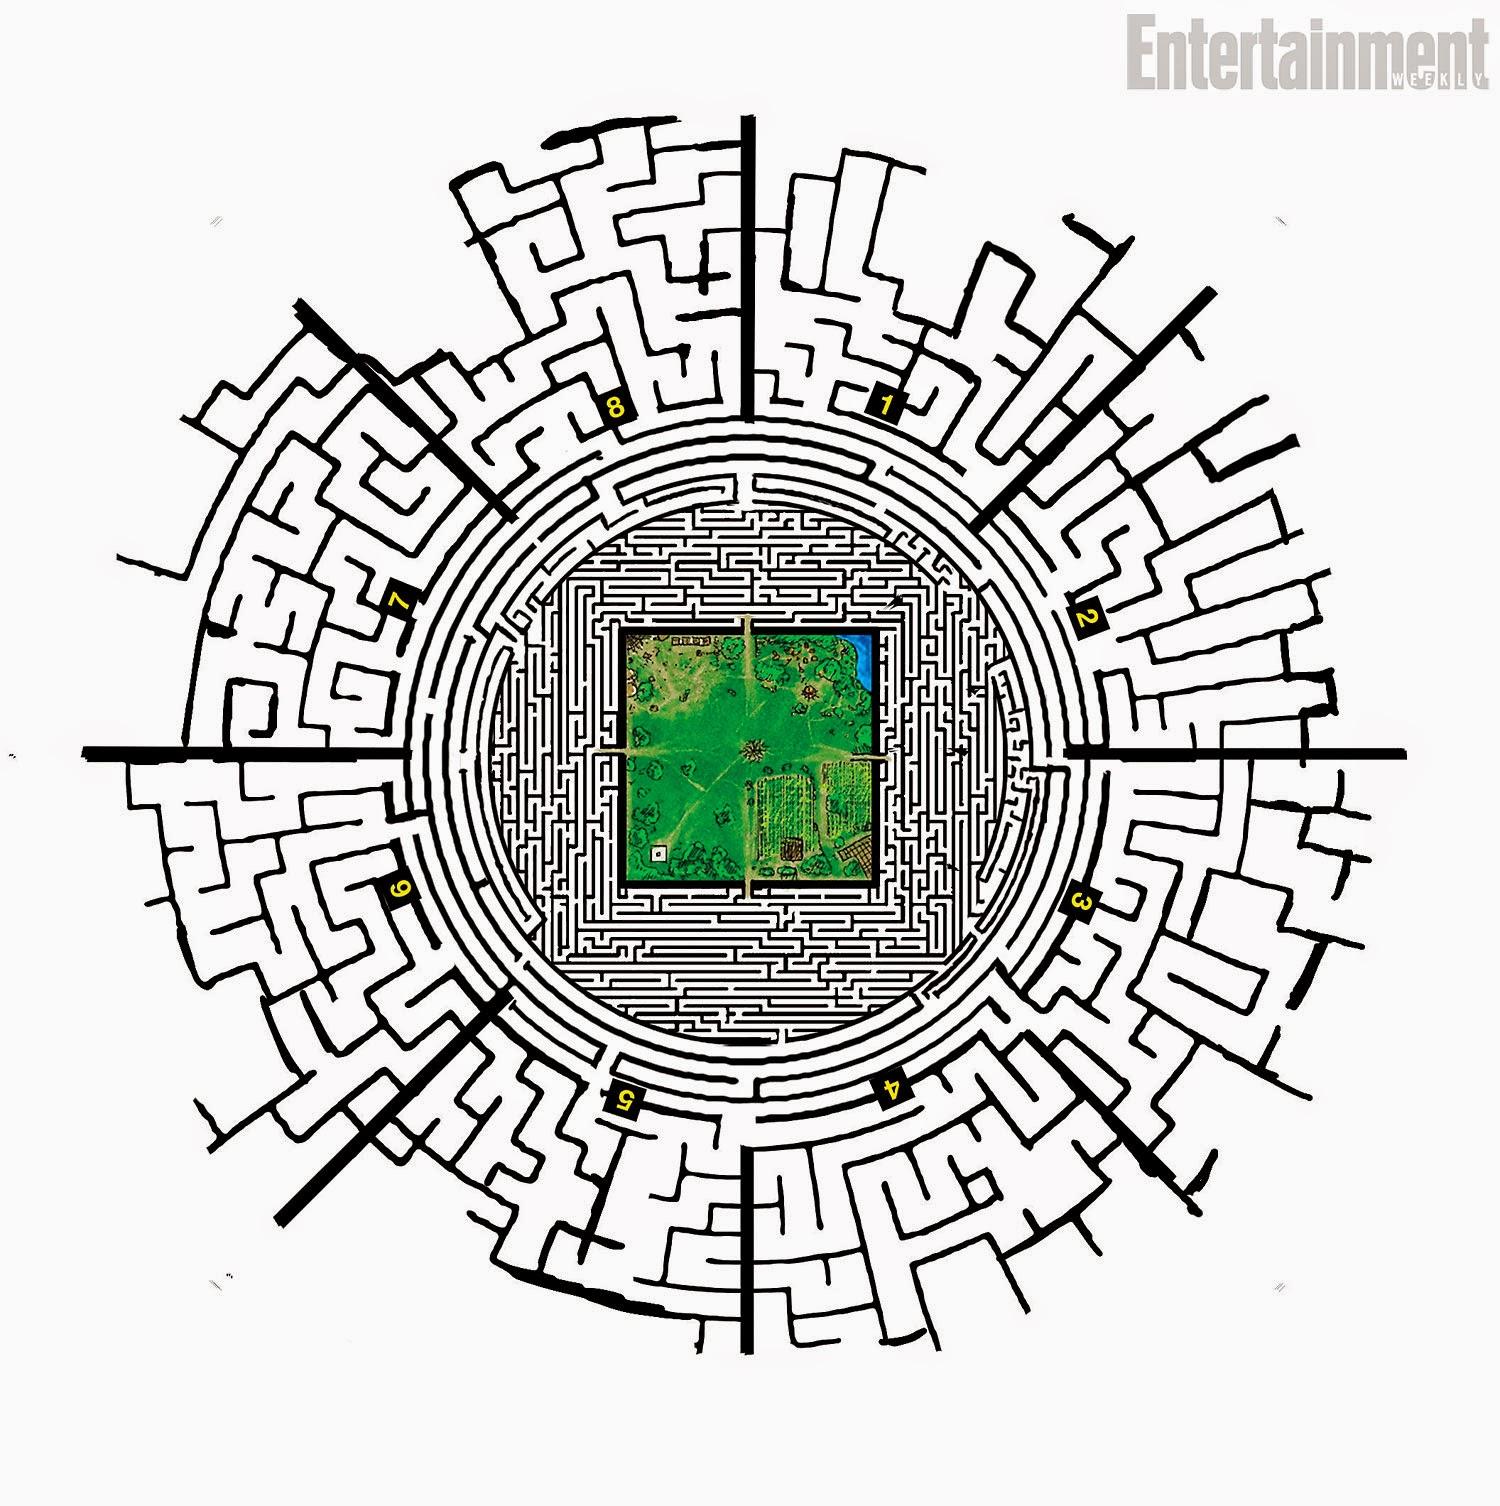 The Maze Runner Blog: August 2014